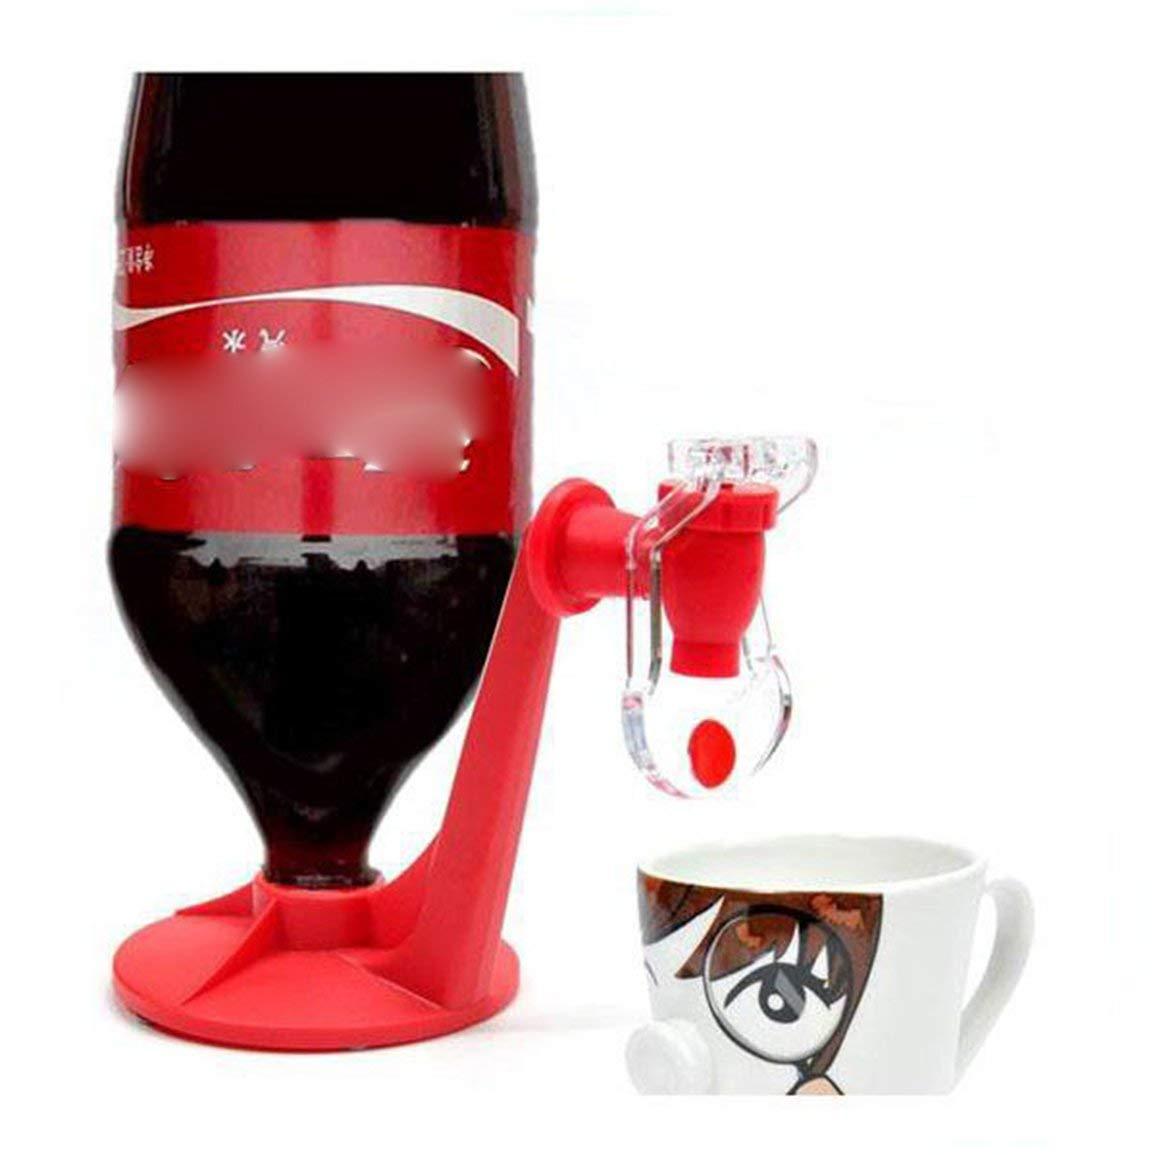 fghfhfgjdfj Botella de Coca Cola Invertido Dispensador de Agua Fuente de Agua Bebida M/áquina Interruptor Bebida Soda Bebedero